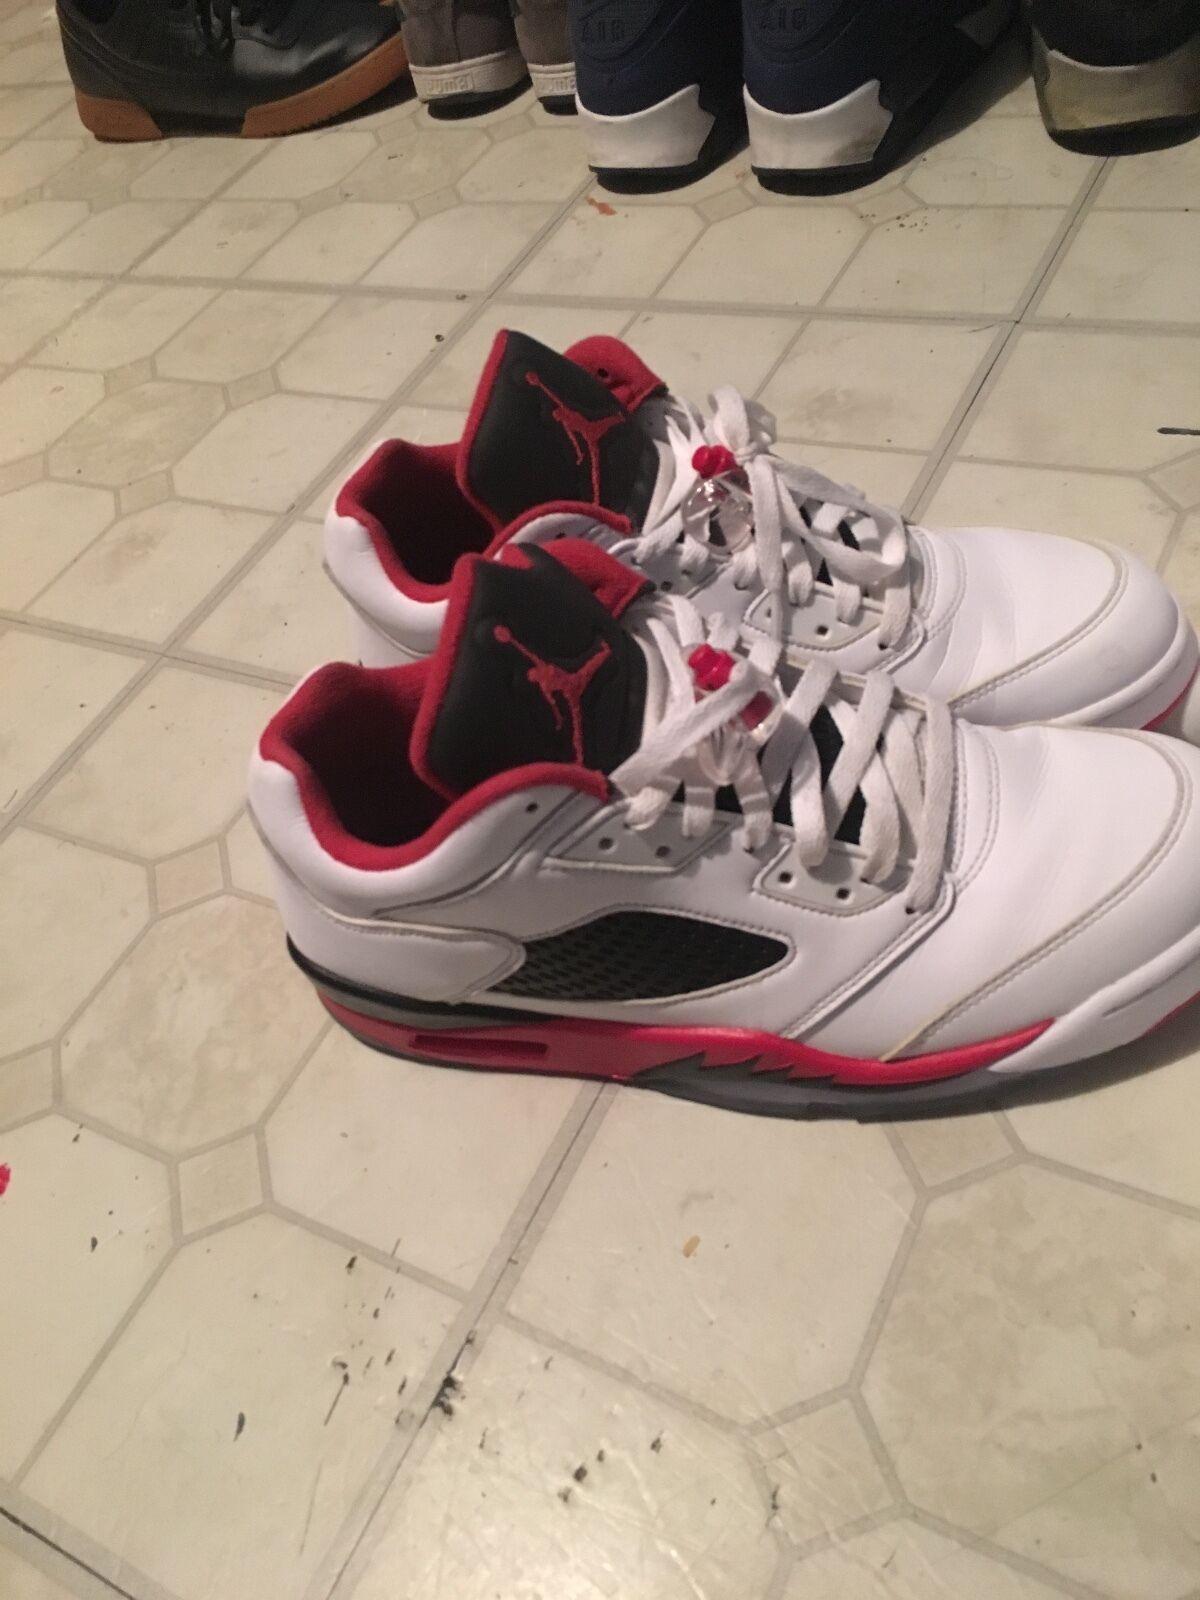 Nike Air Jordan V 5 Retro Low FIRE RED 10.5 white black red